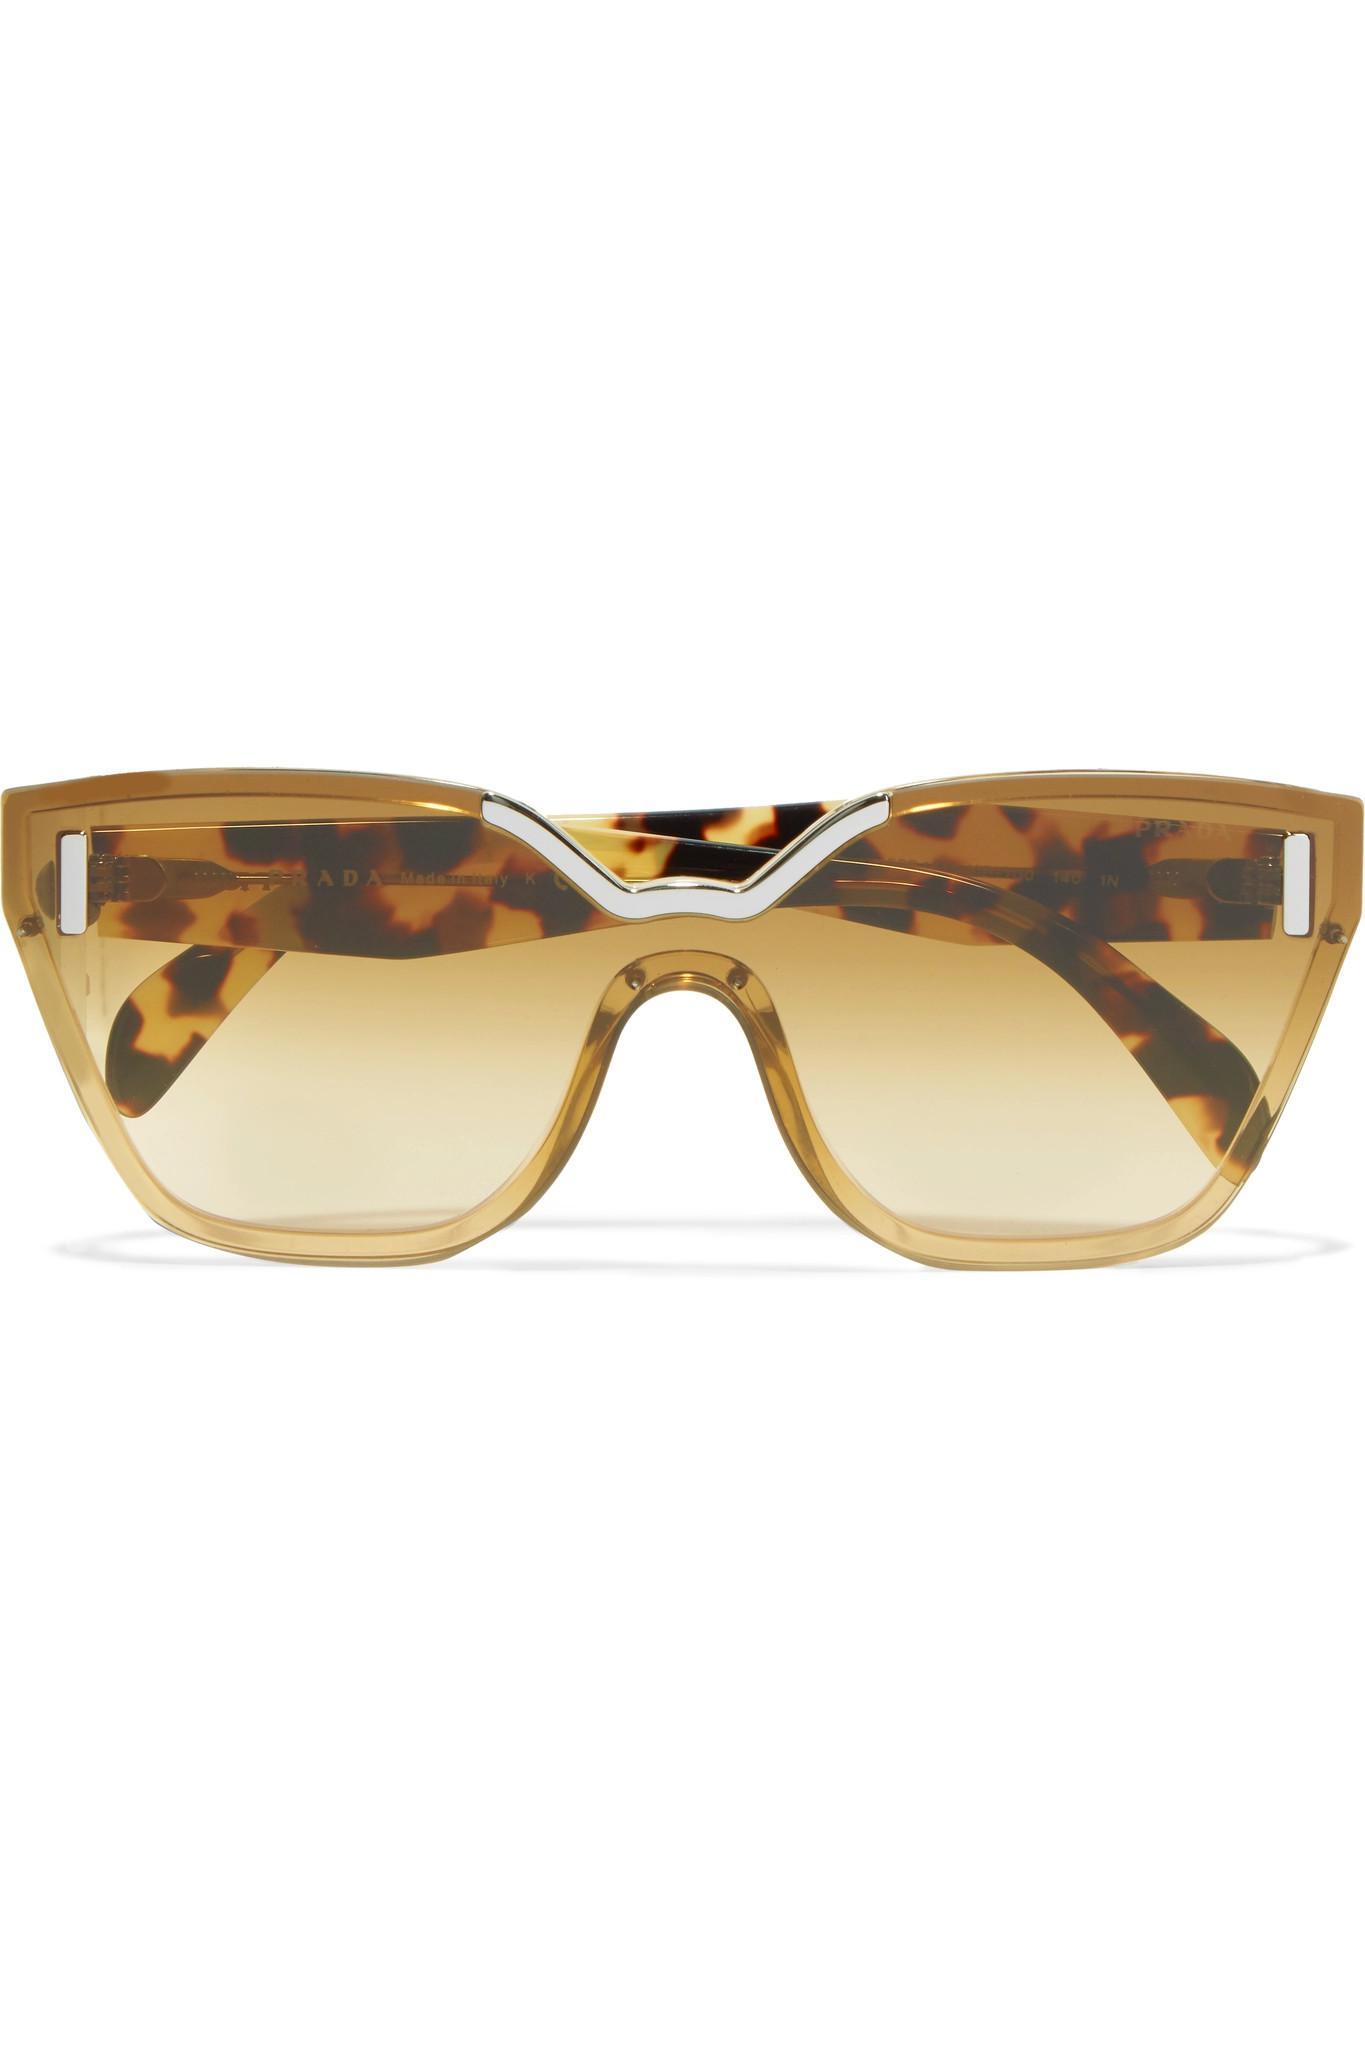 09742b146056 ... australia prada cat eye tortoiseshell acetate and silver tone sunglasses  lyst 1830f c2001